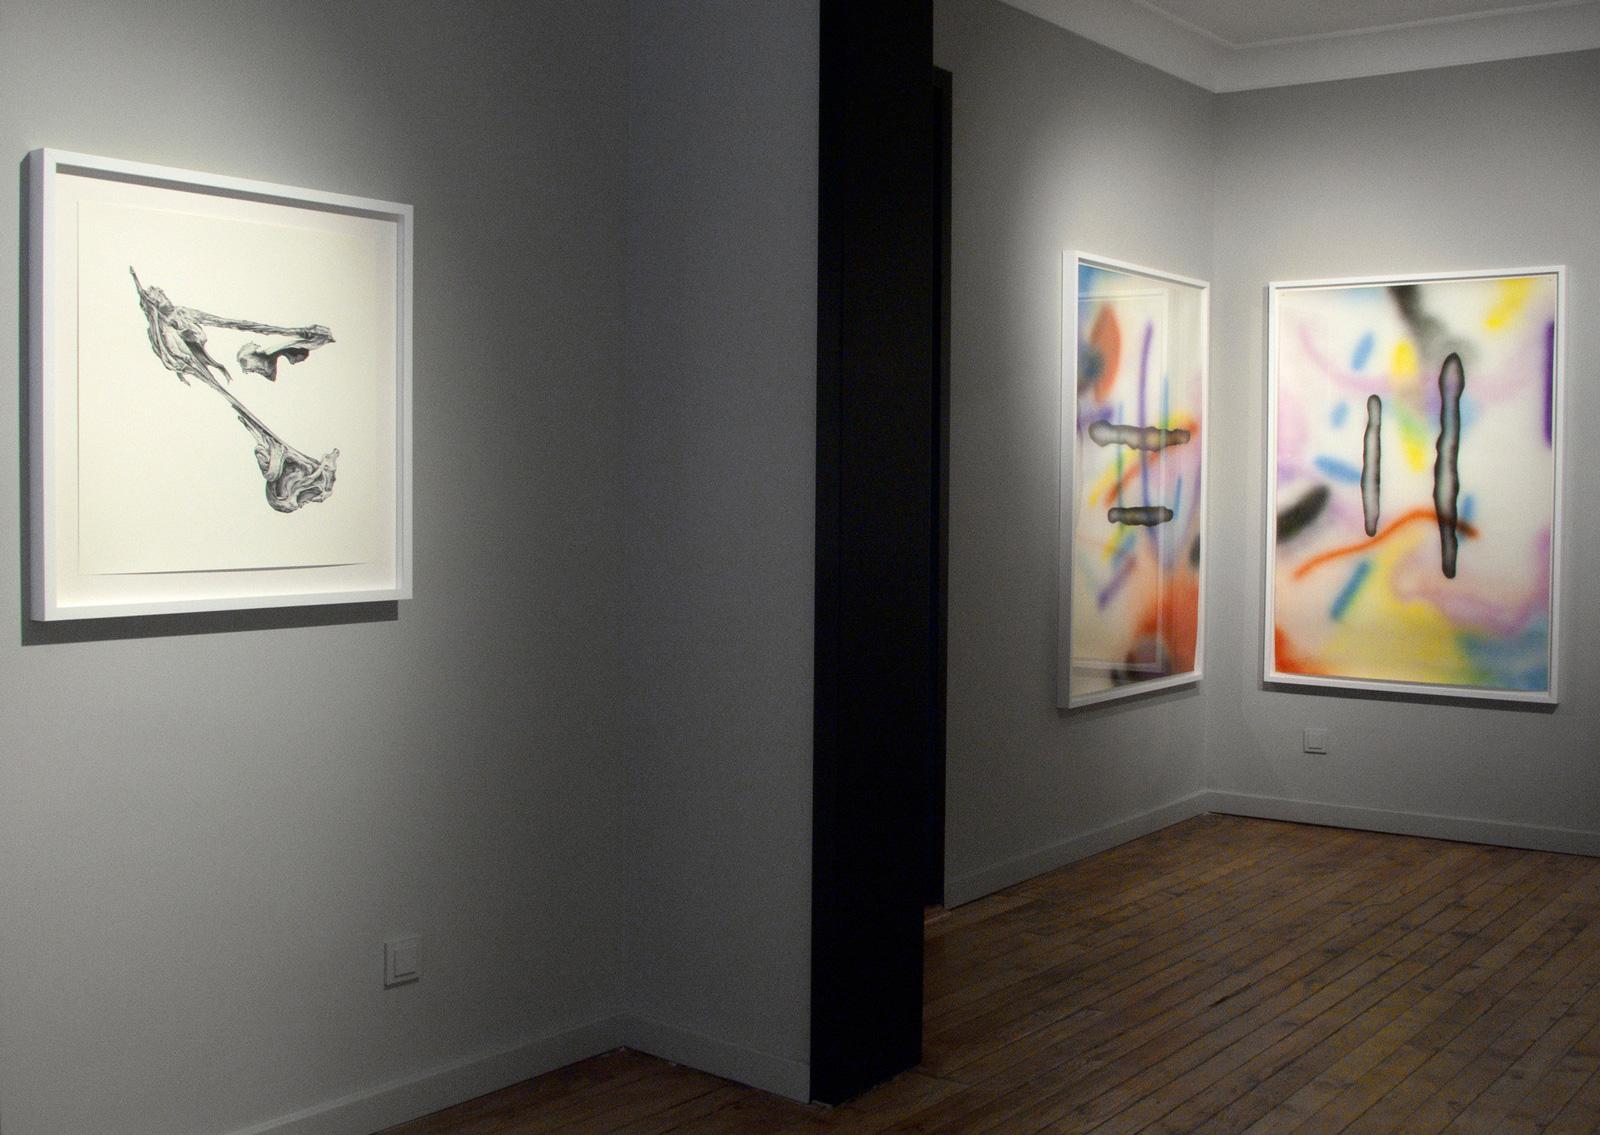 istanbulserfotograflari - blok art space